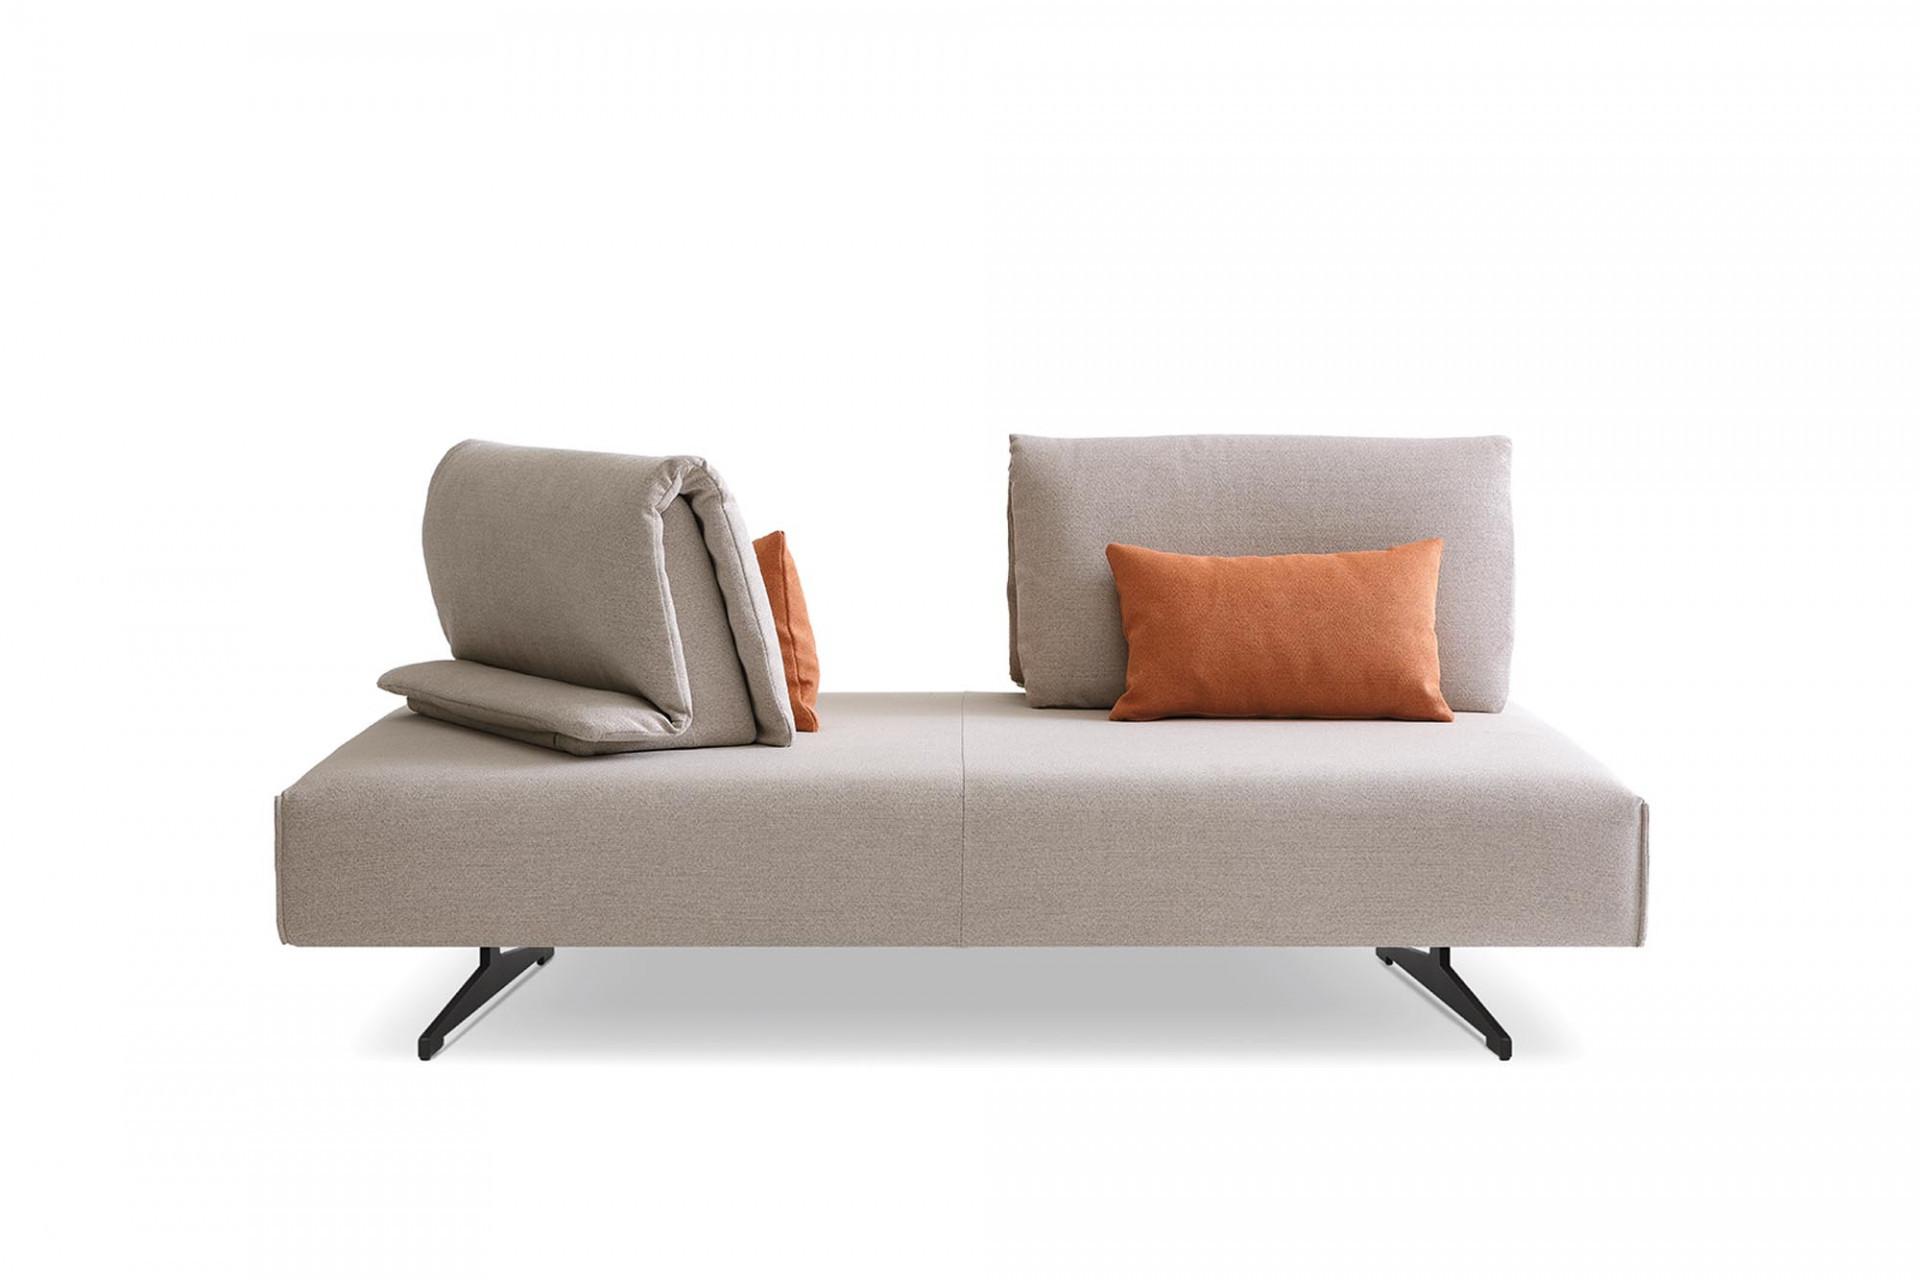 Sofas In Fabric Abbraccio Lecomfort